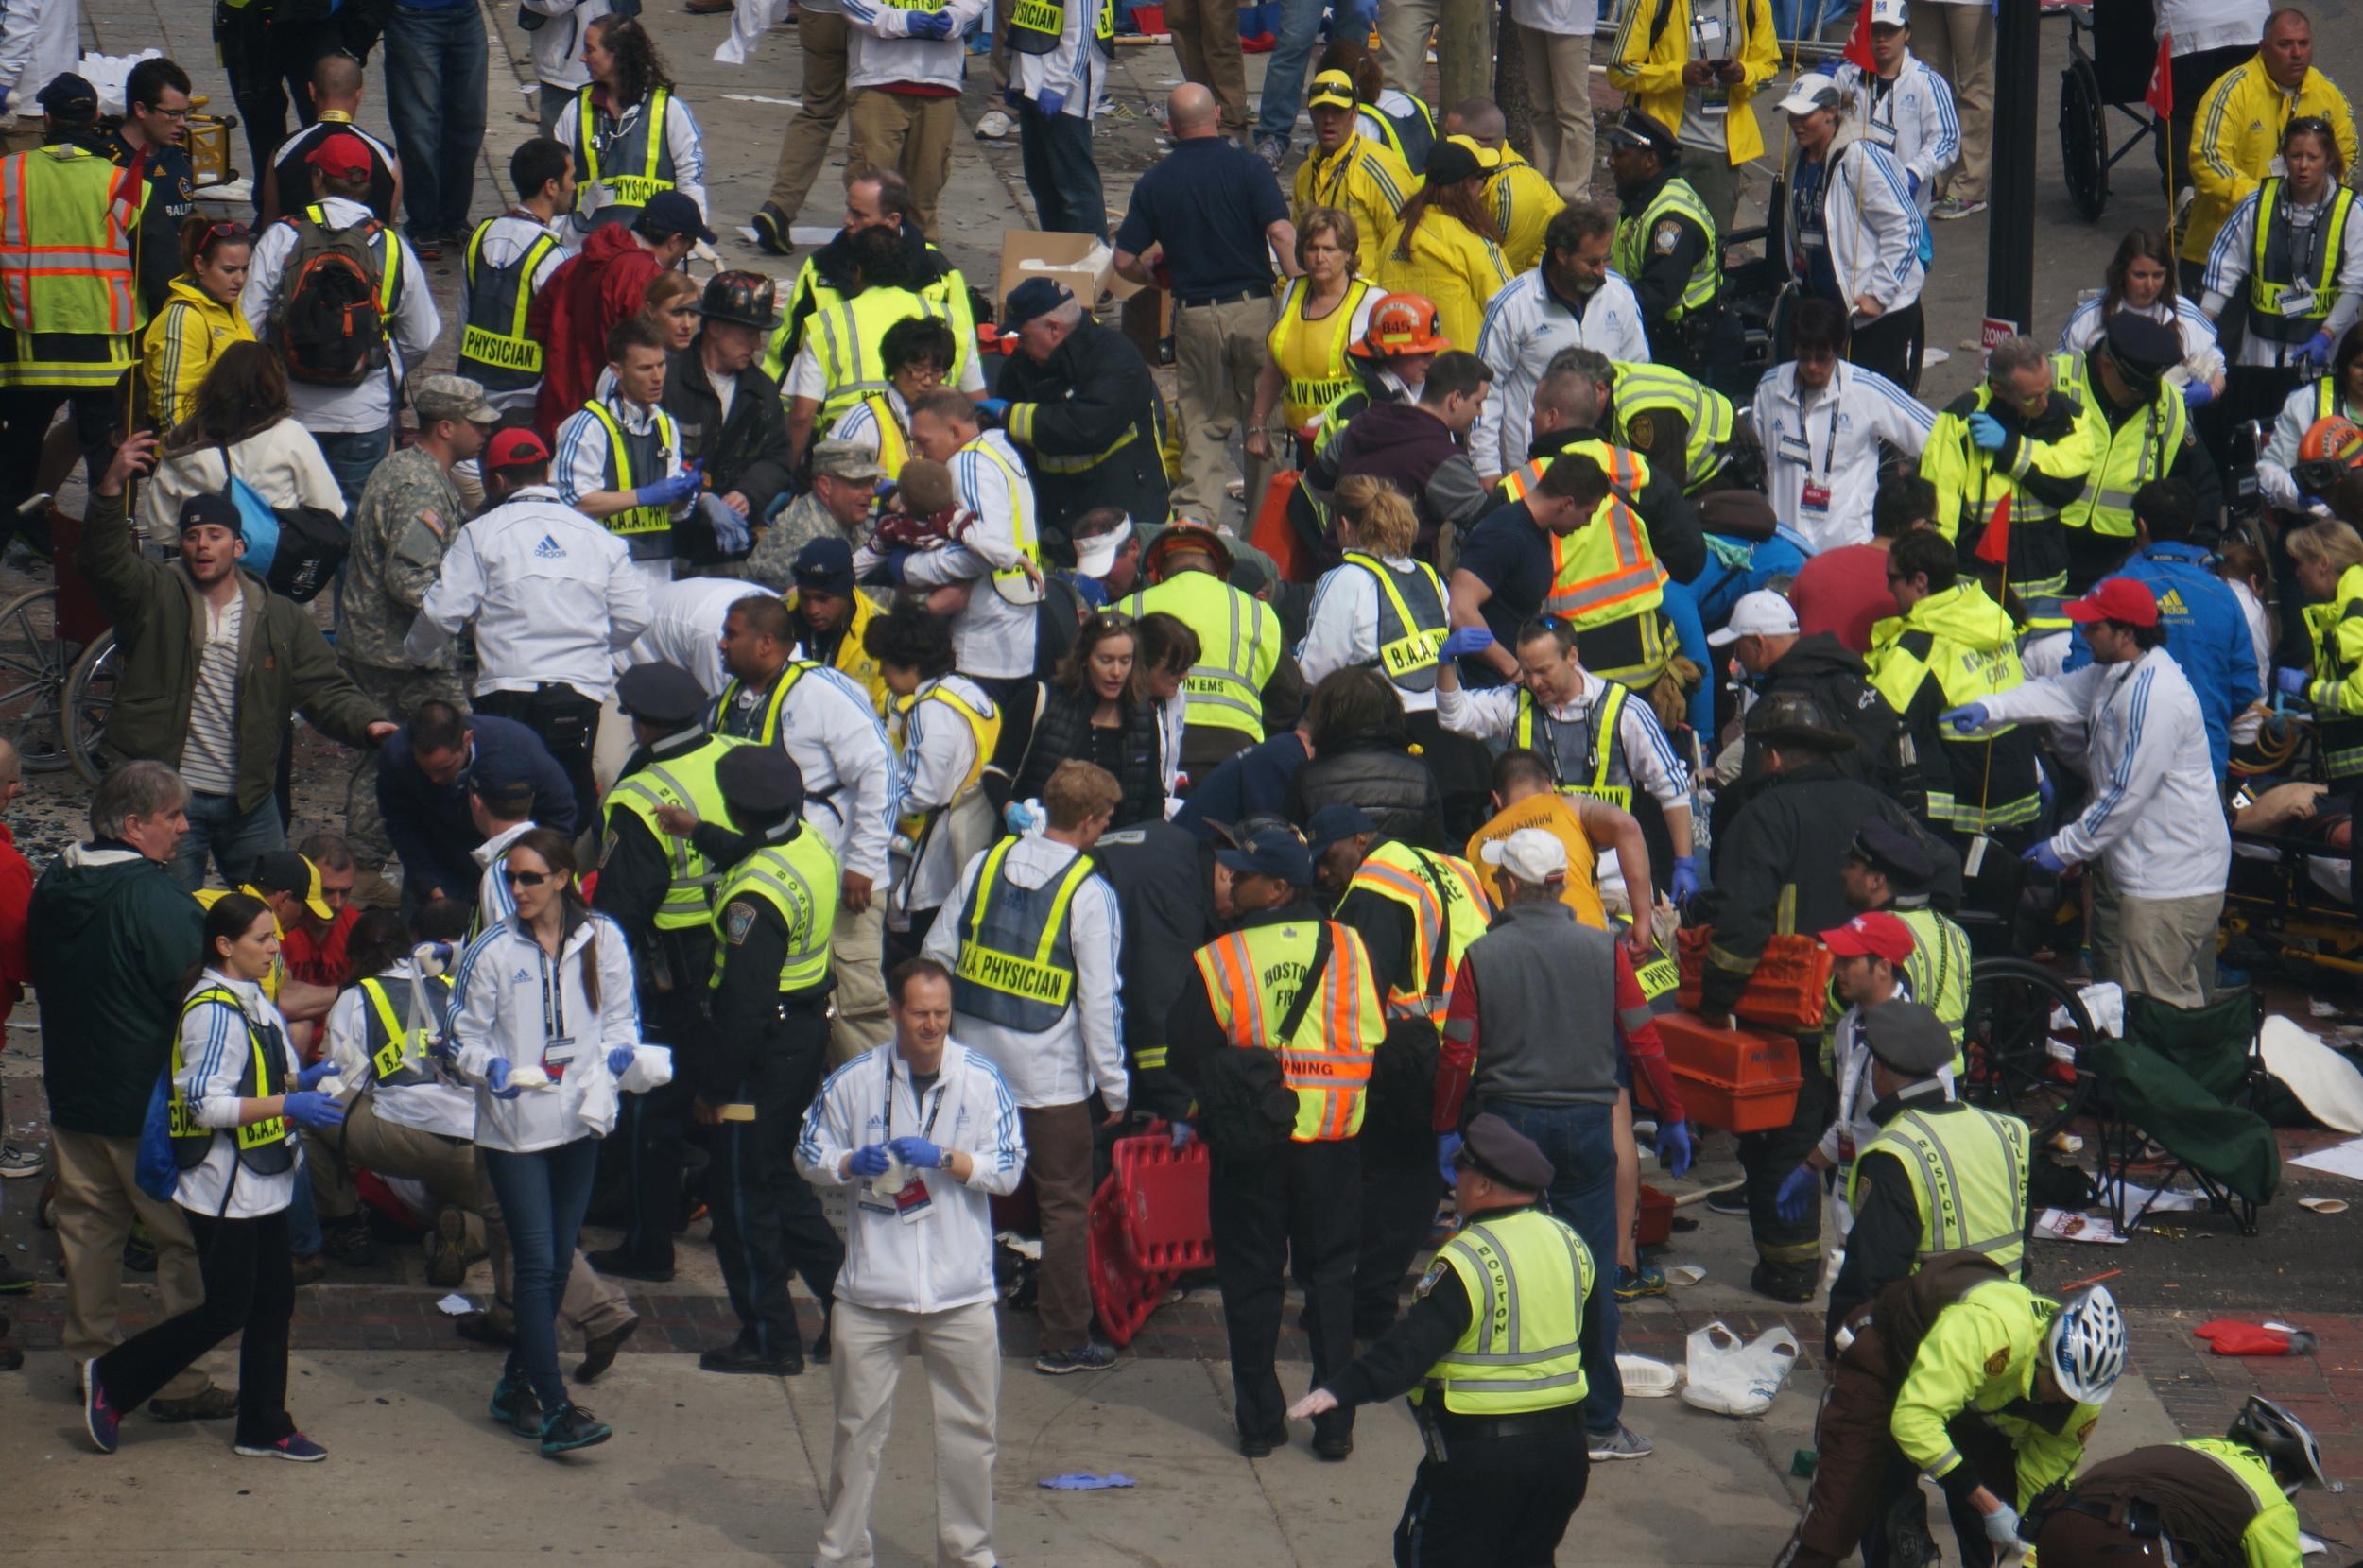 boston_marathon_first-responders.jpg